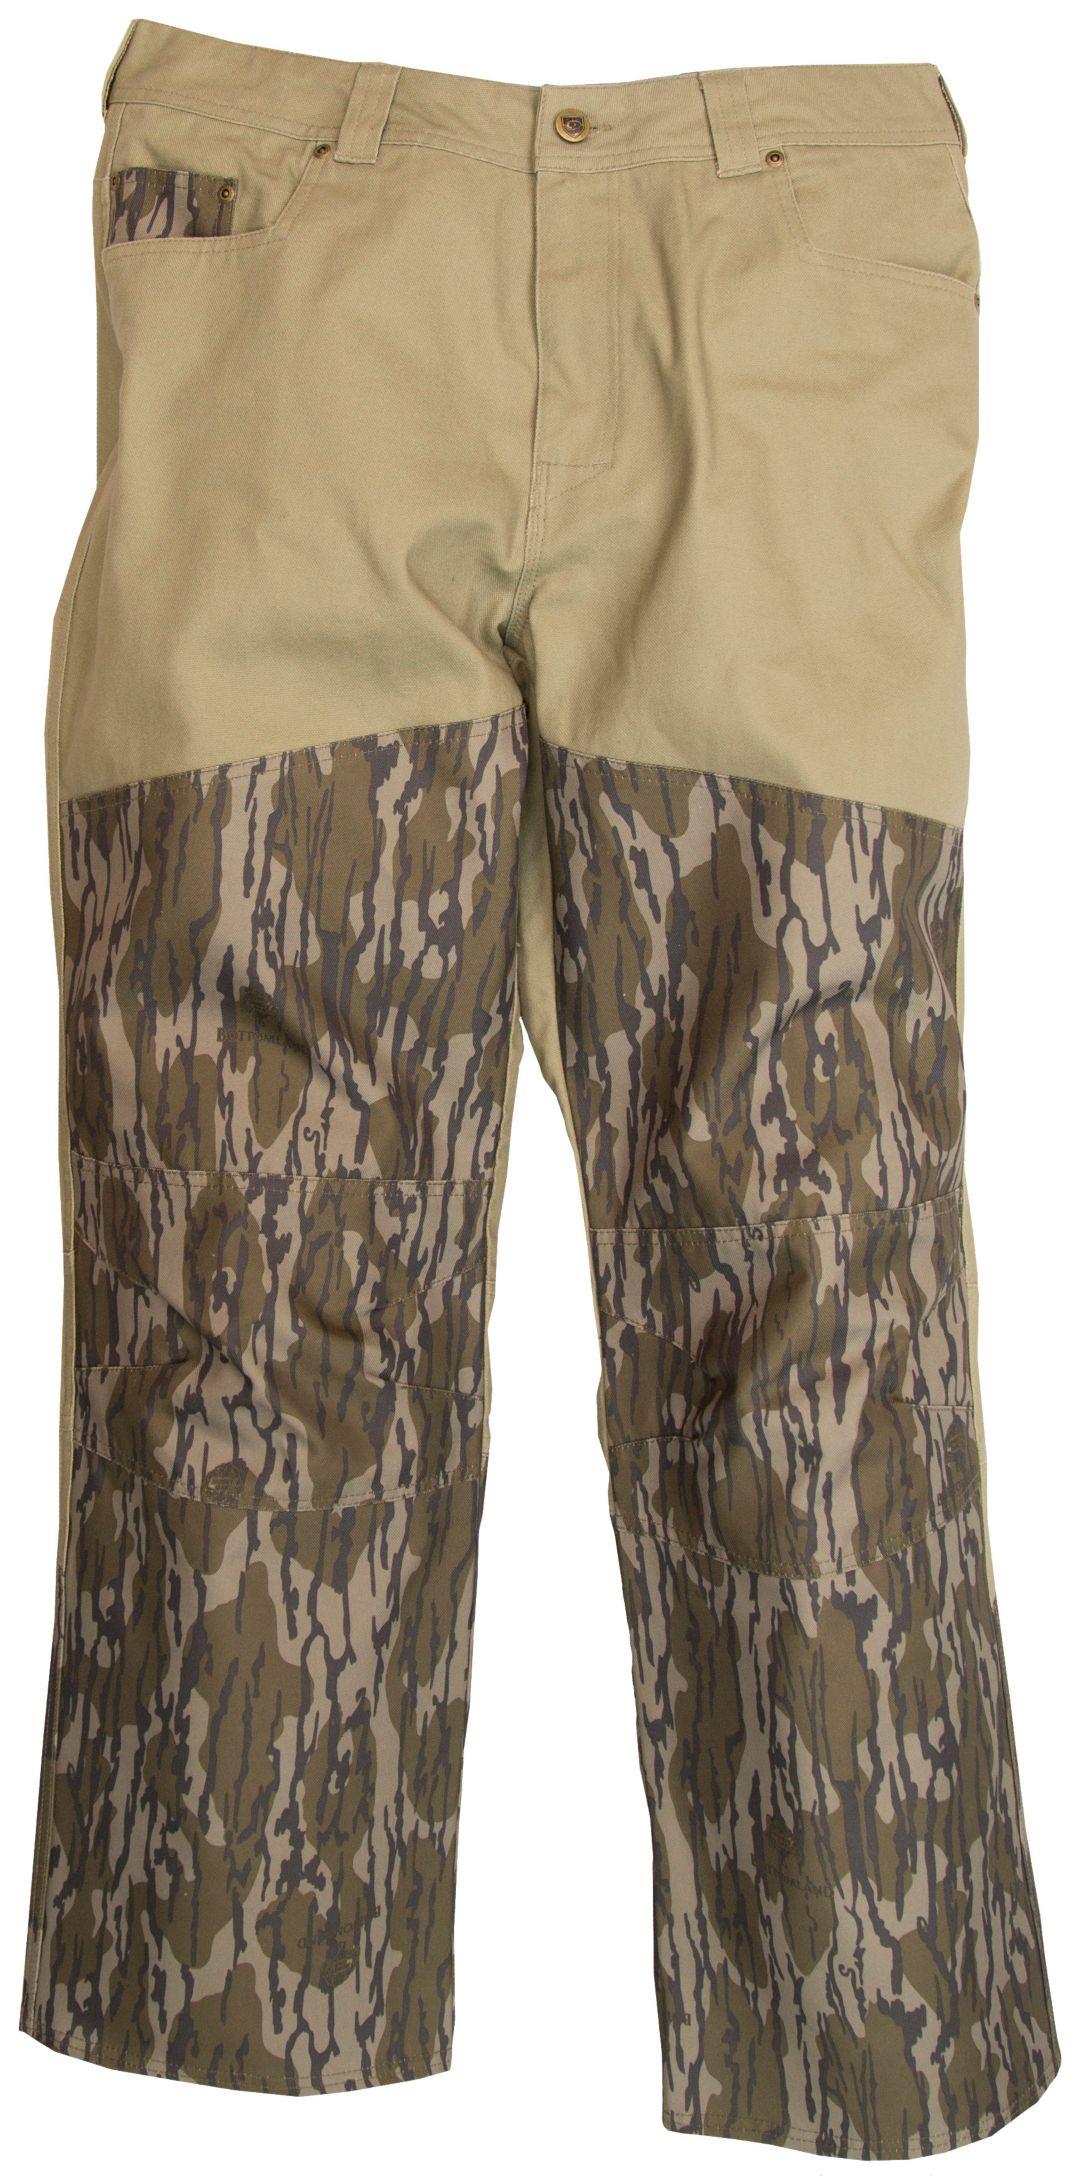 f88f52fdc5113 GameKeeper Men's CRP Camo Hunting Pants | Field & Stream